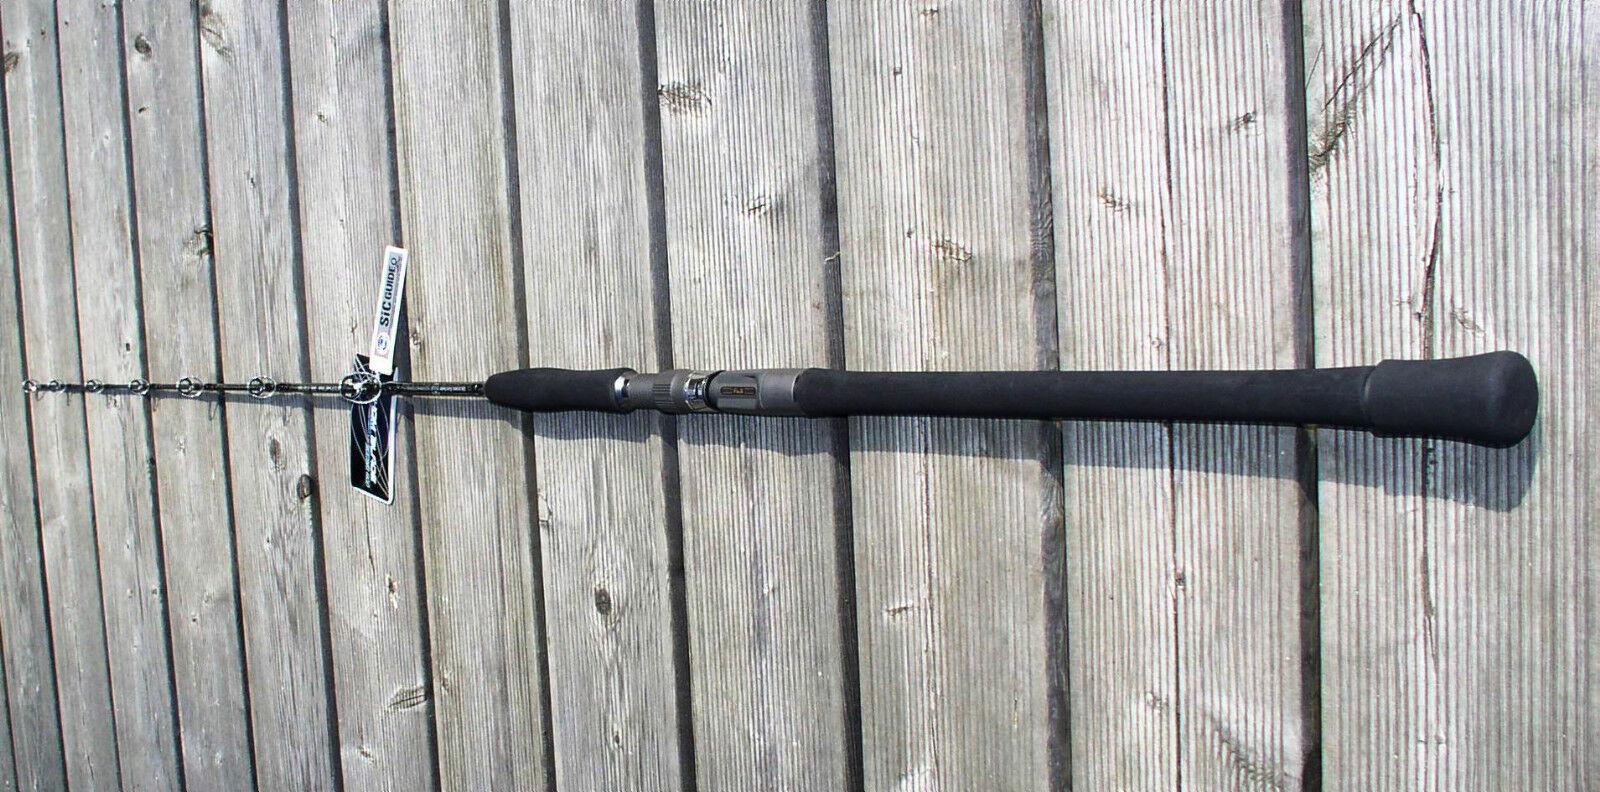 OTI Fathom Blade jigging rod 5,4  1,64m casting - 400gr. WG, speedjigging